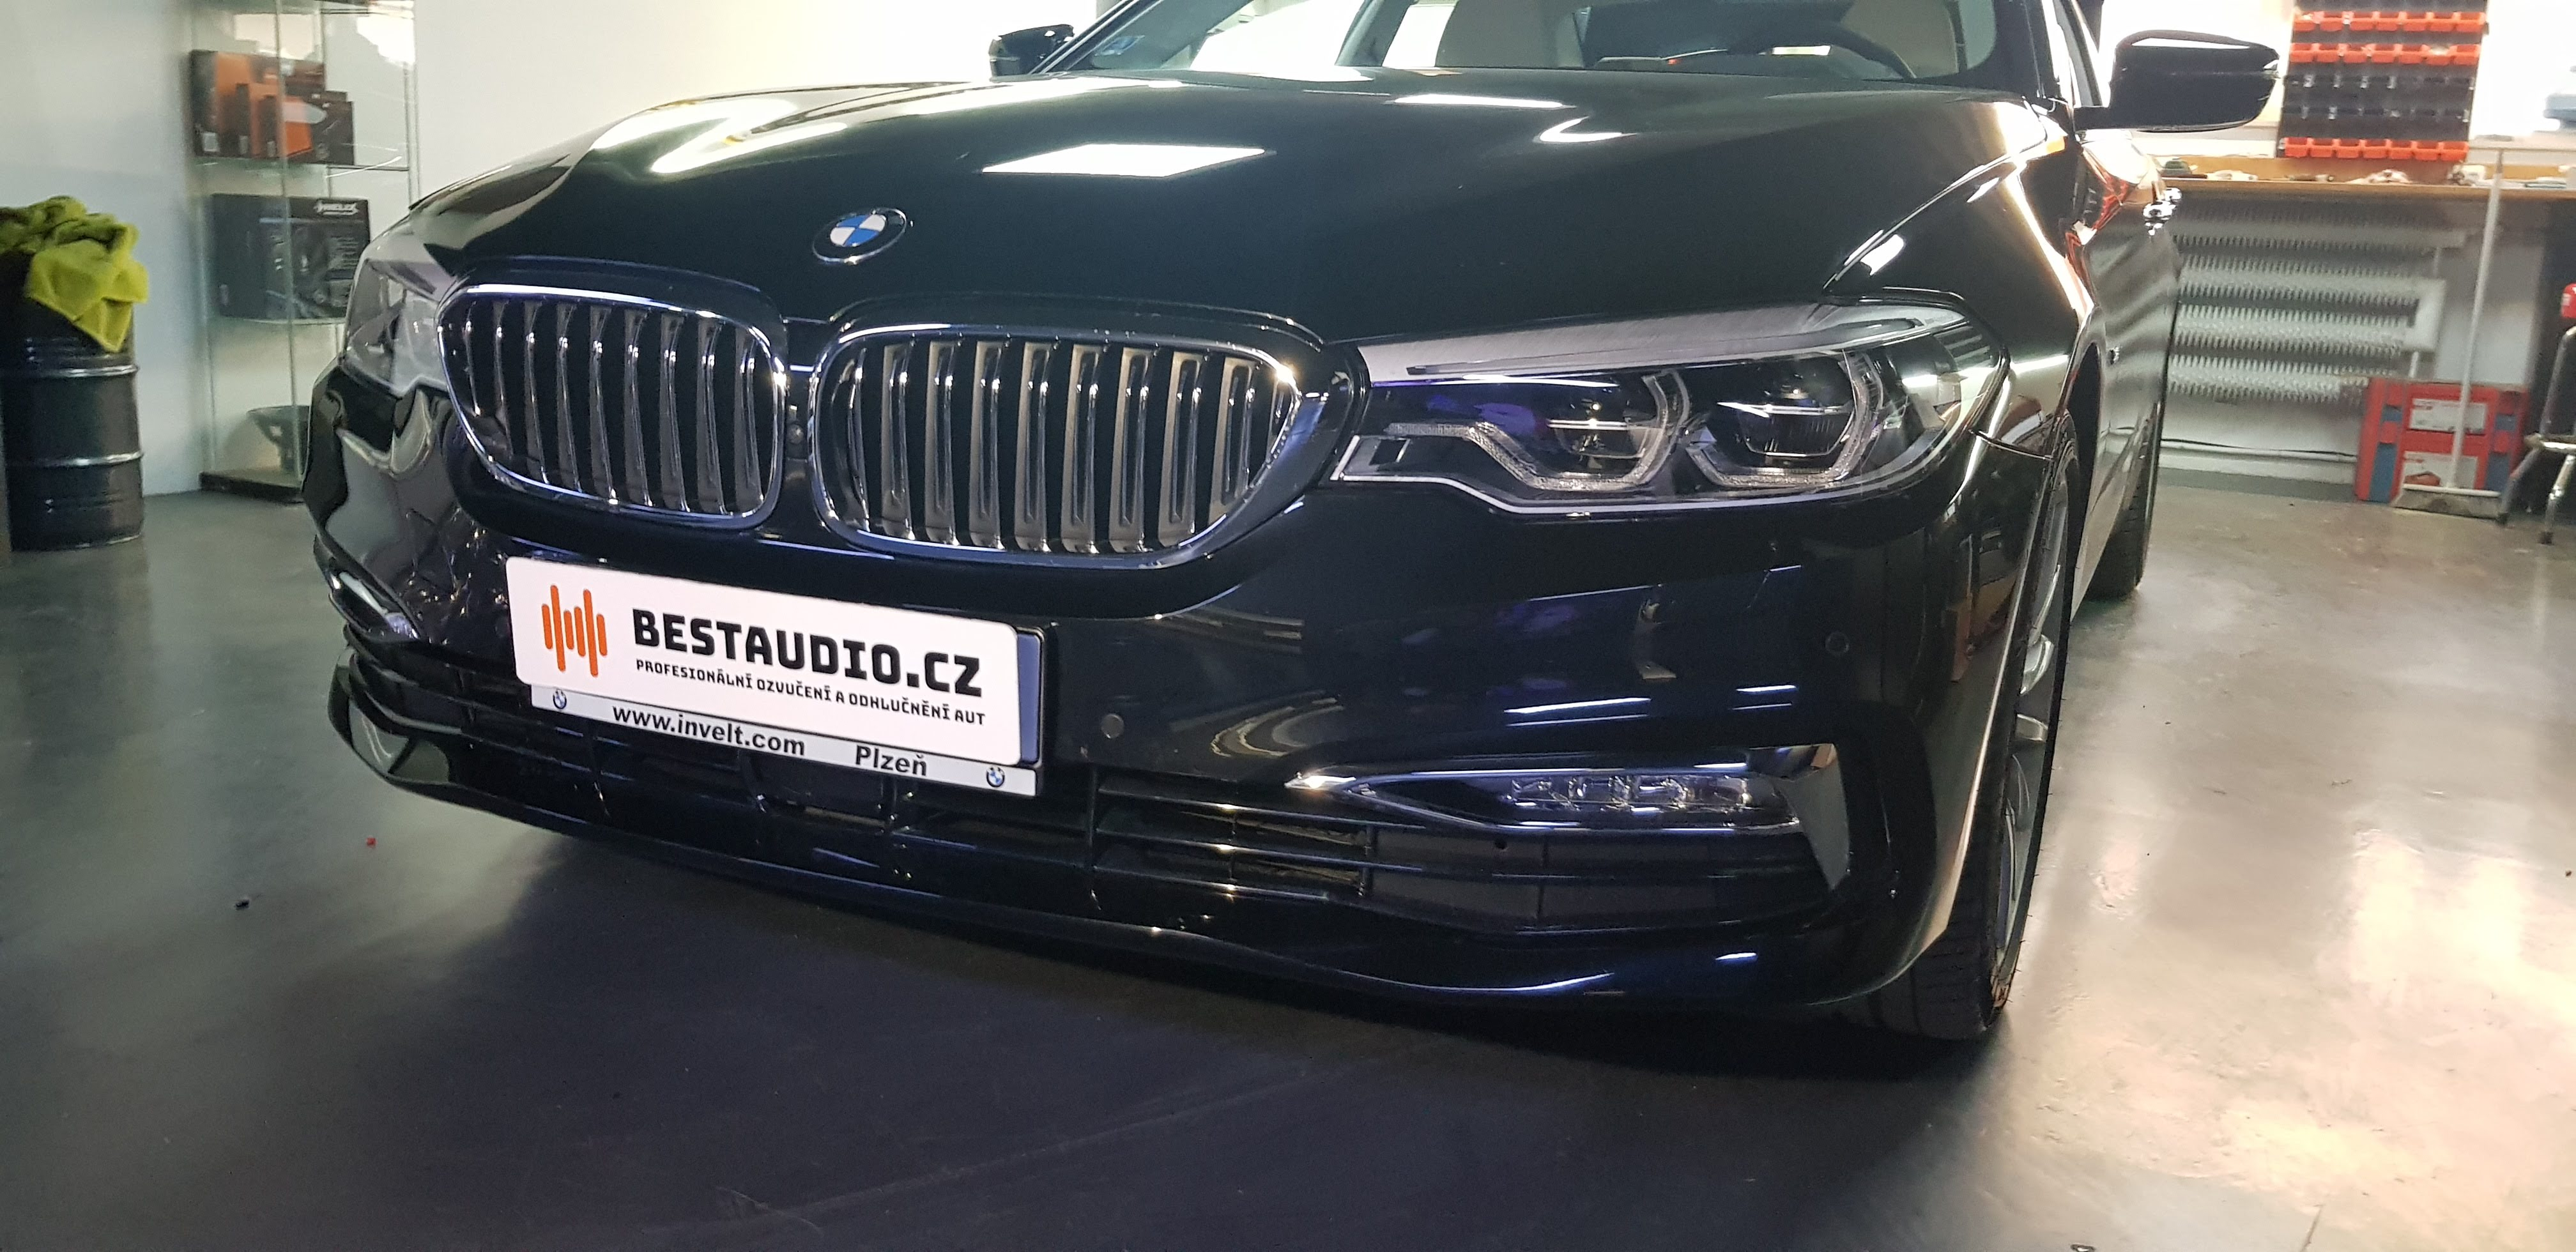 BMW 5 (G30) – ozvučení bez zásahu do vozu – upgrade premiového HiFi Sound Systému (option676)